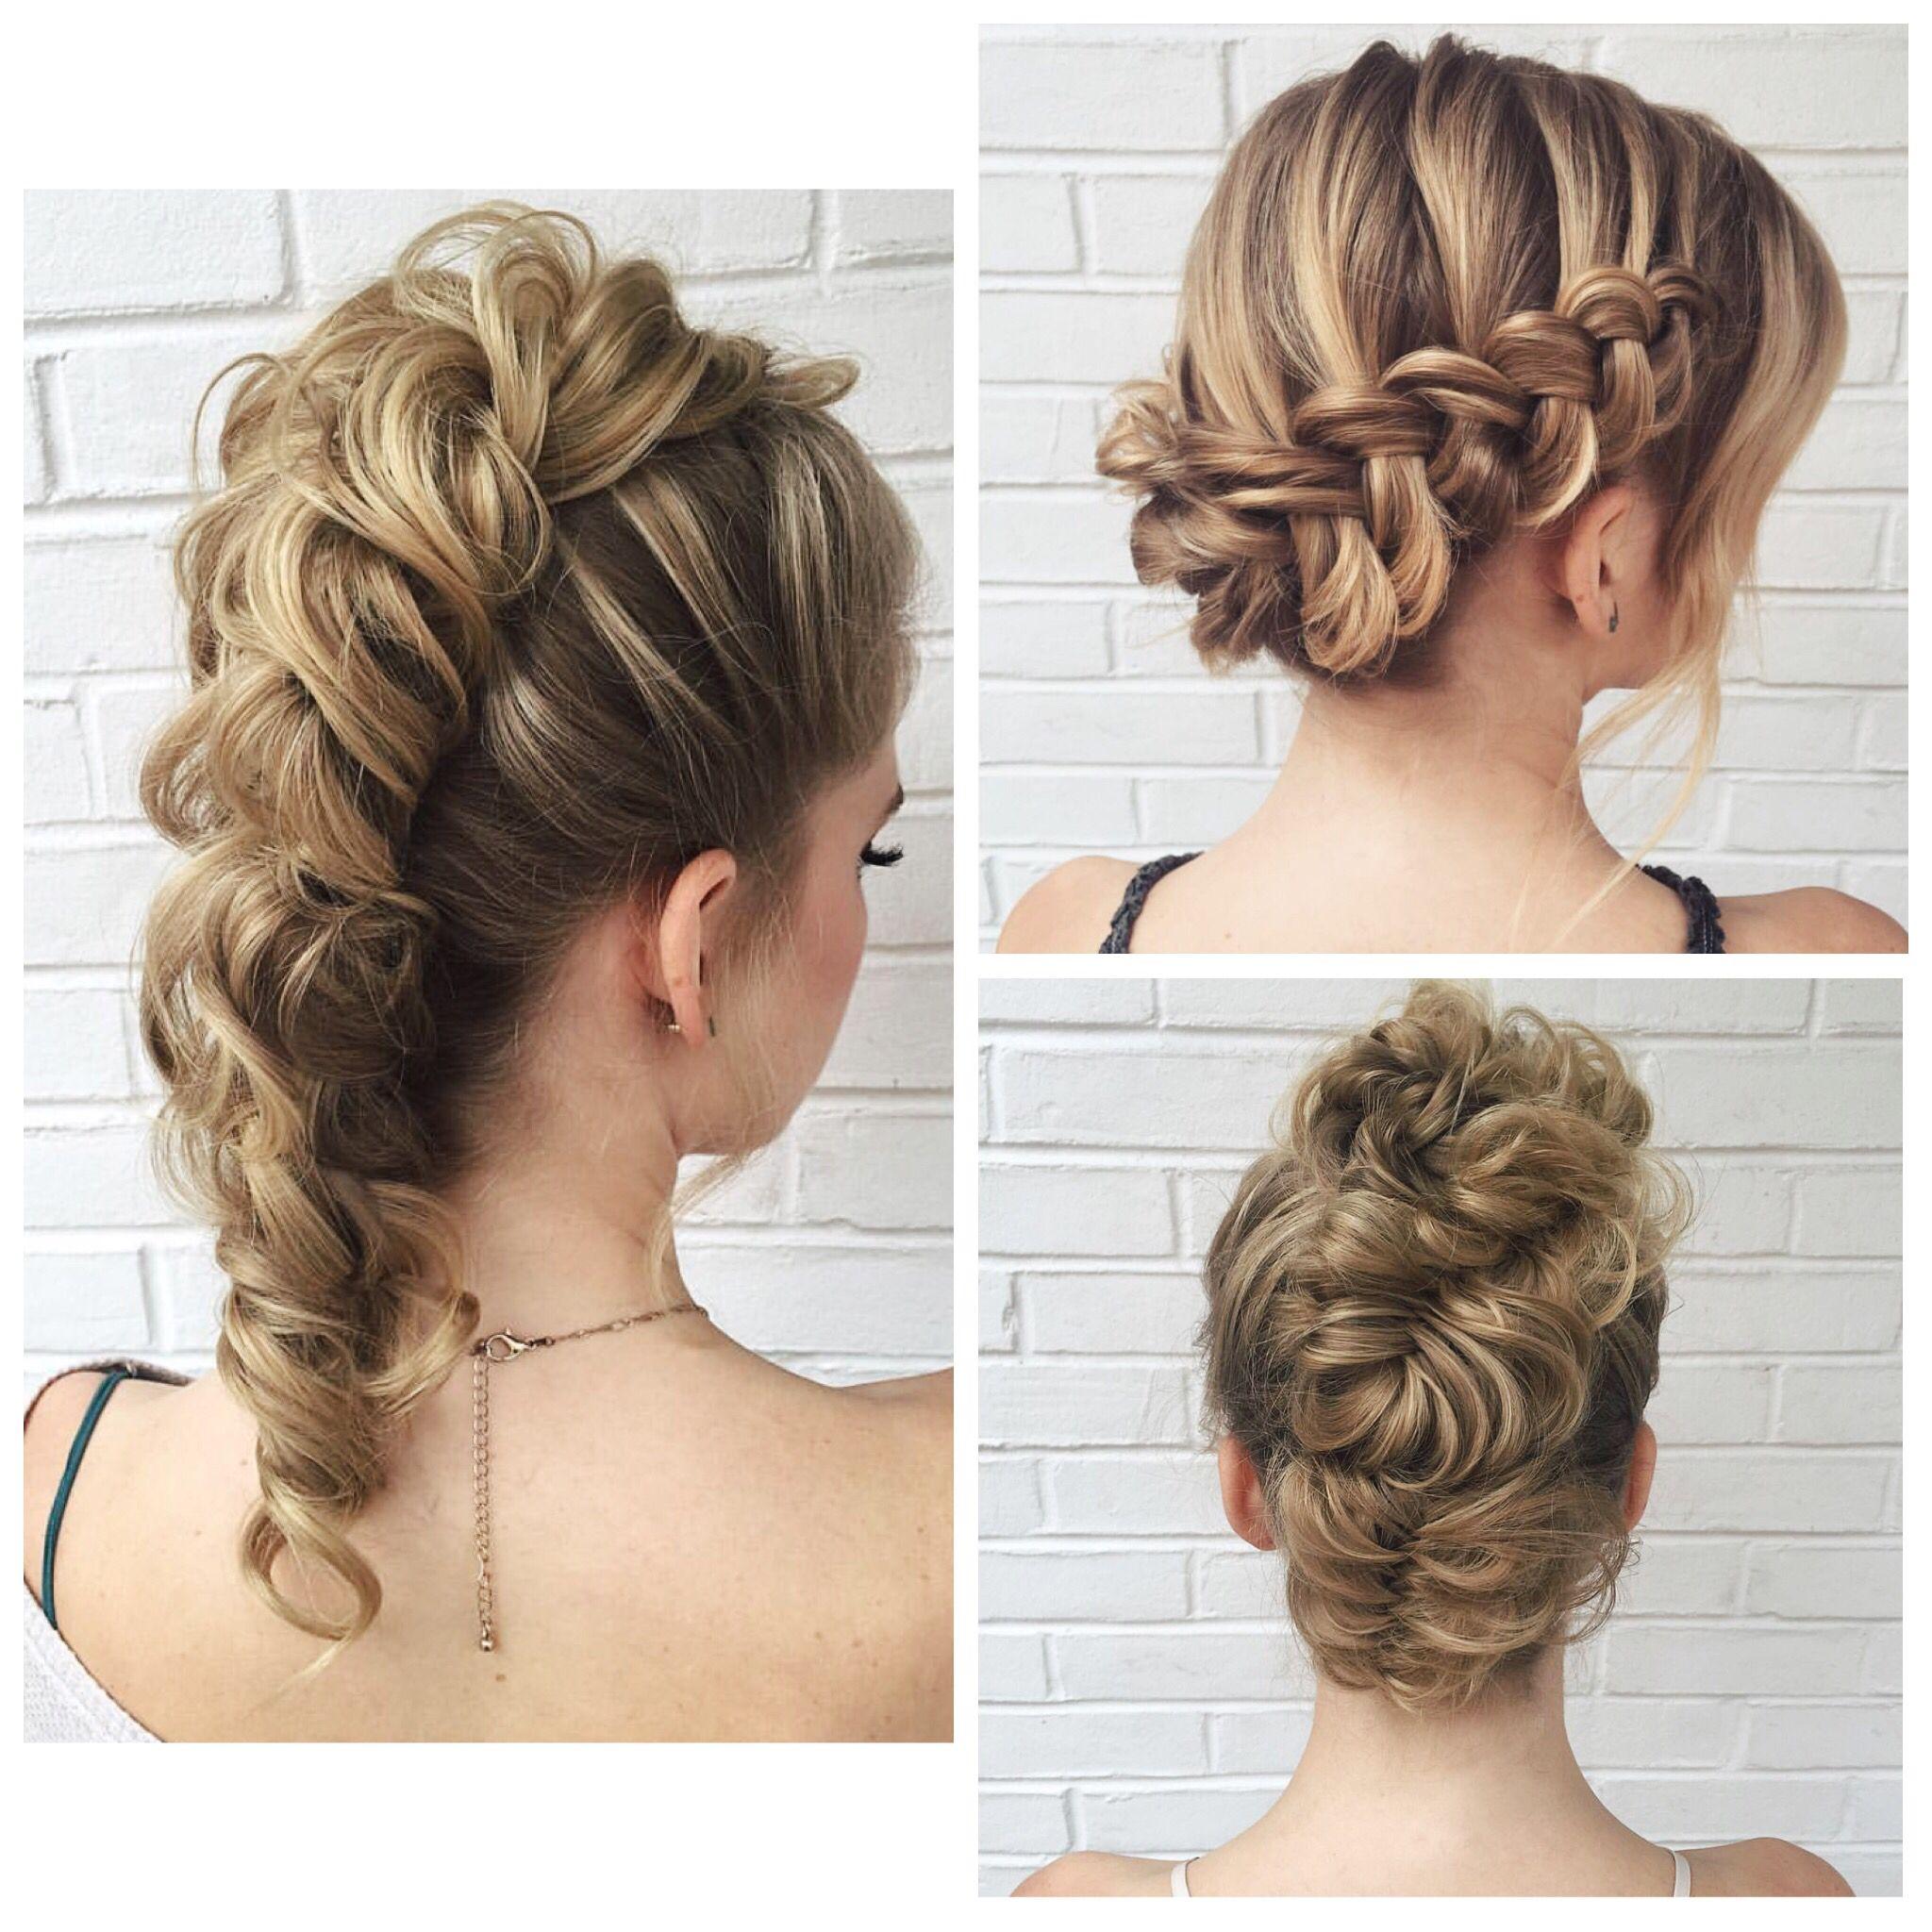 updos for fine hair | hair | hair styles, fine hair updo